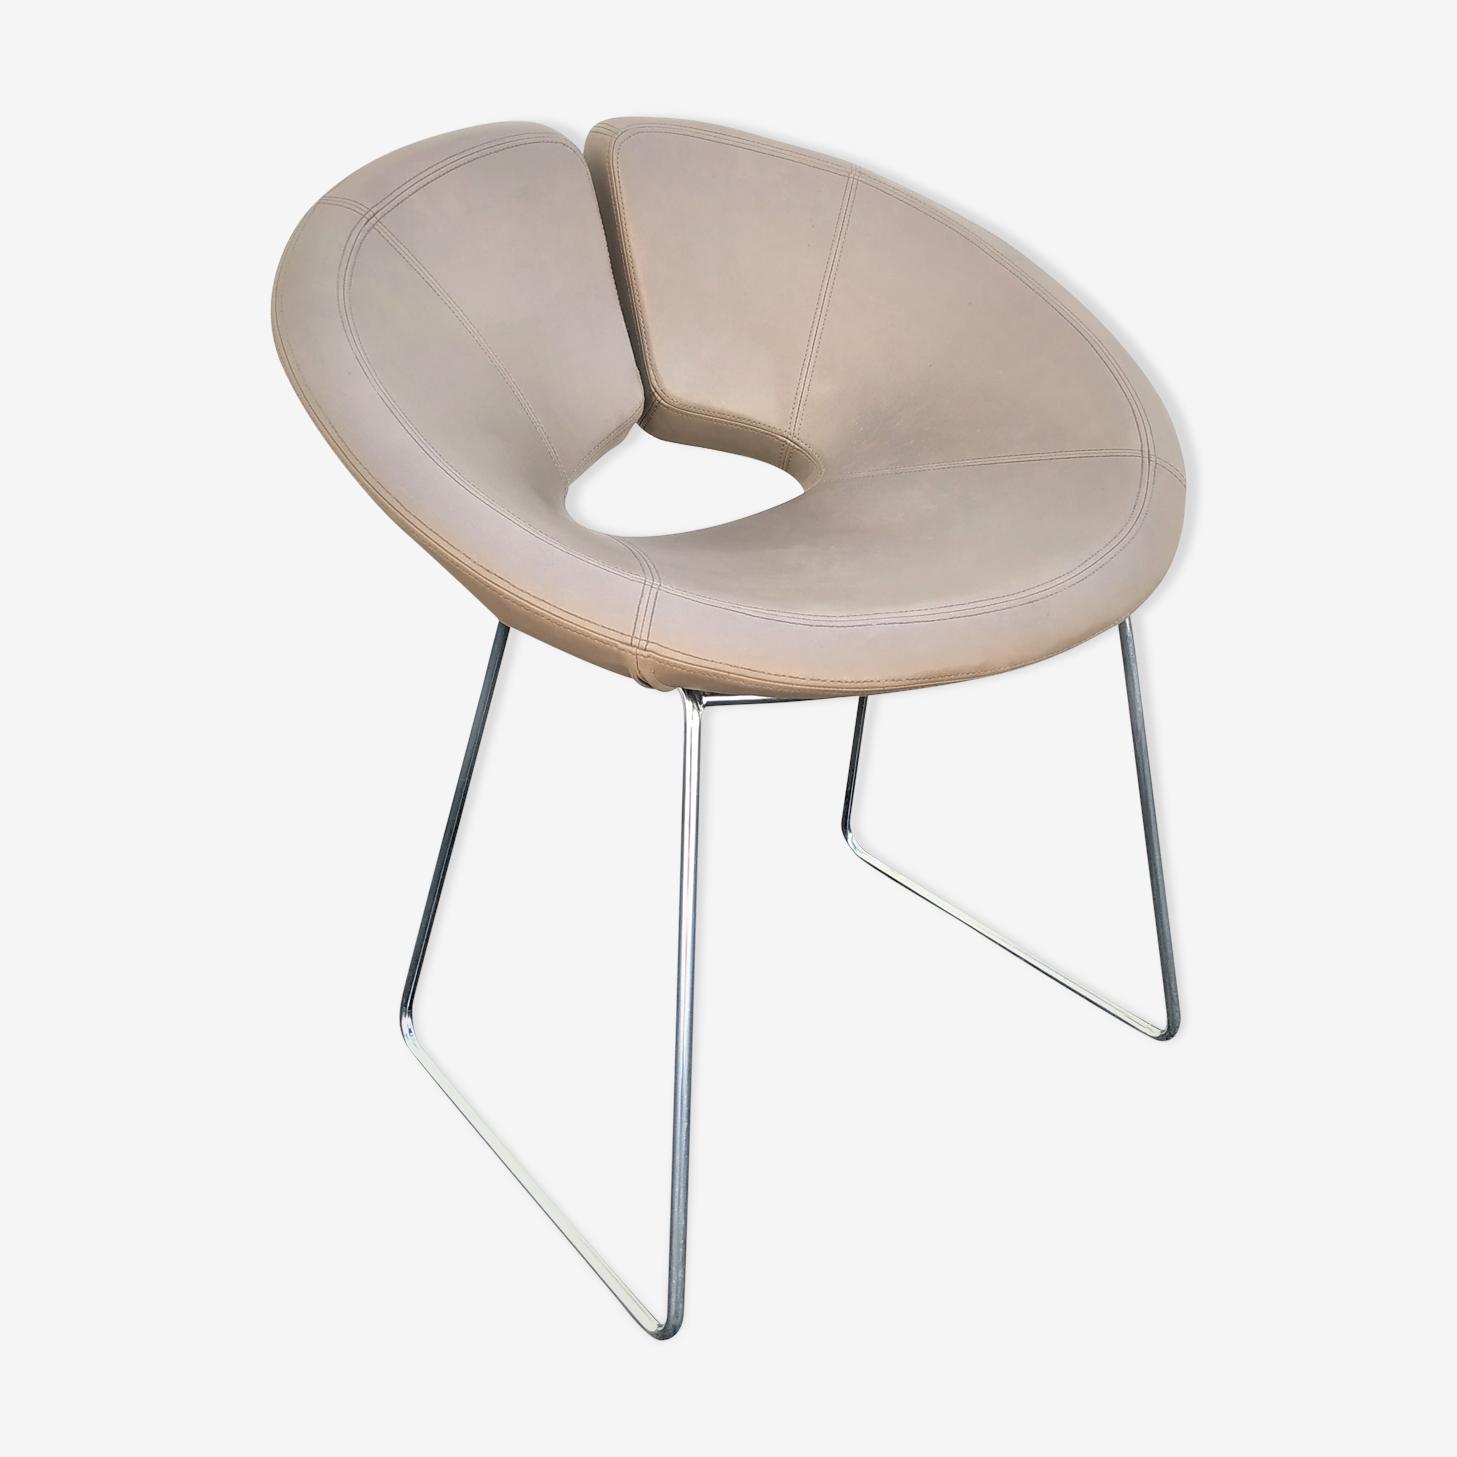 "Armchair leather ""Apollo"" design Patrick Norguet for Artifort"